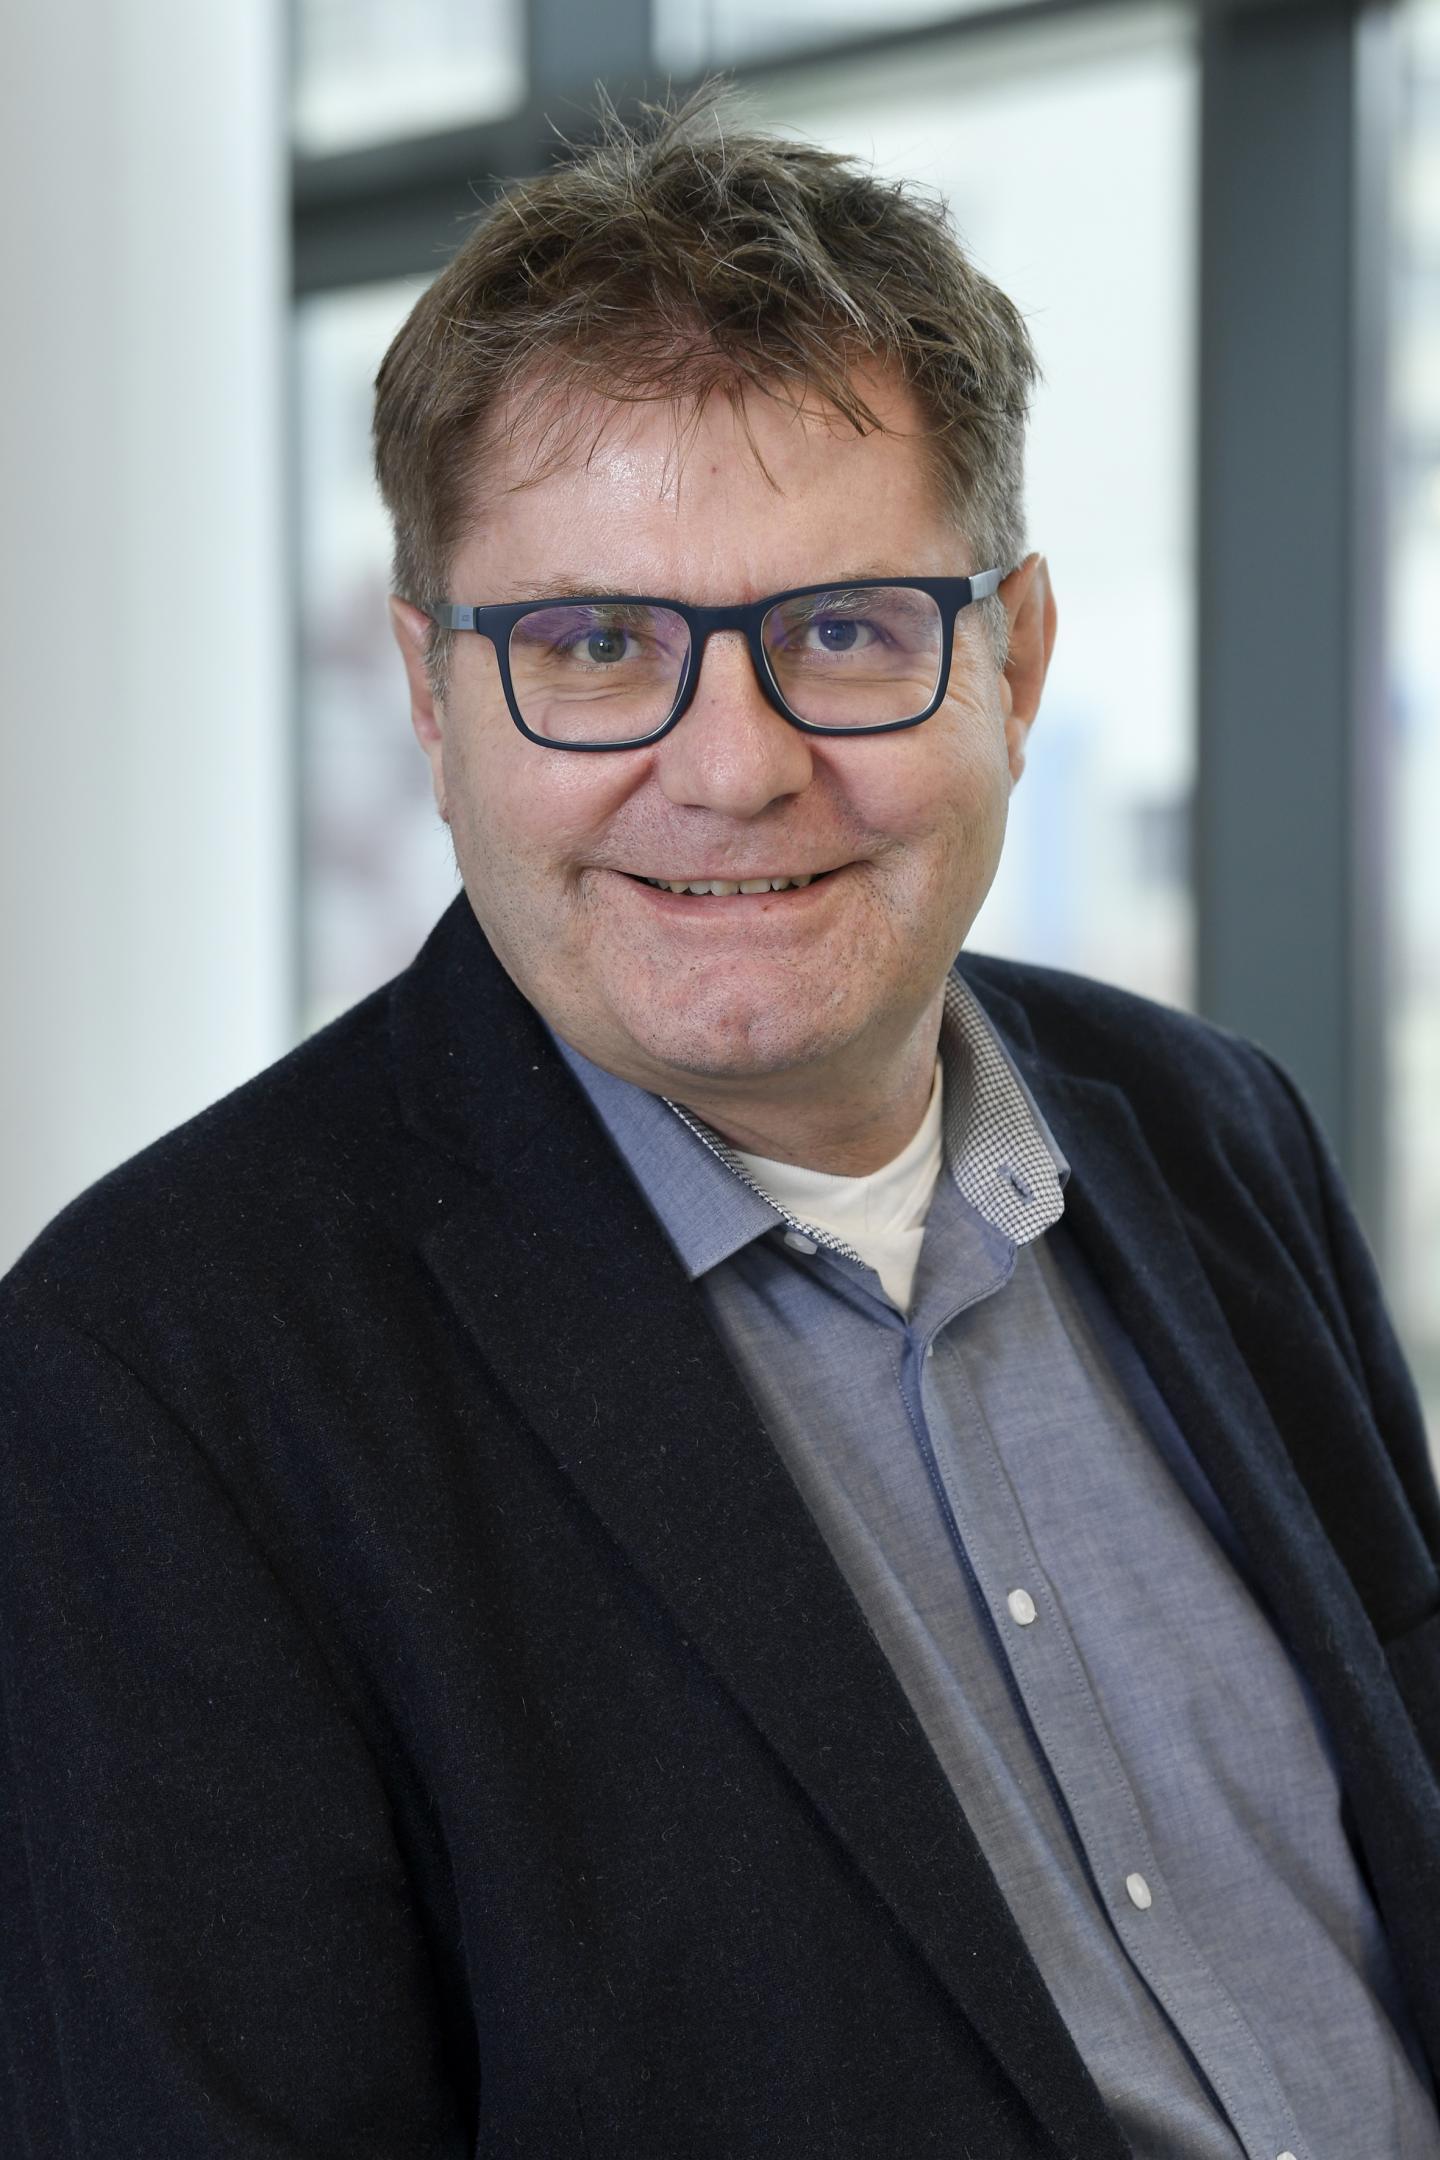 Professor Dr. Norbert Sewald, Bielefeld University